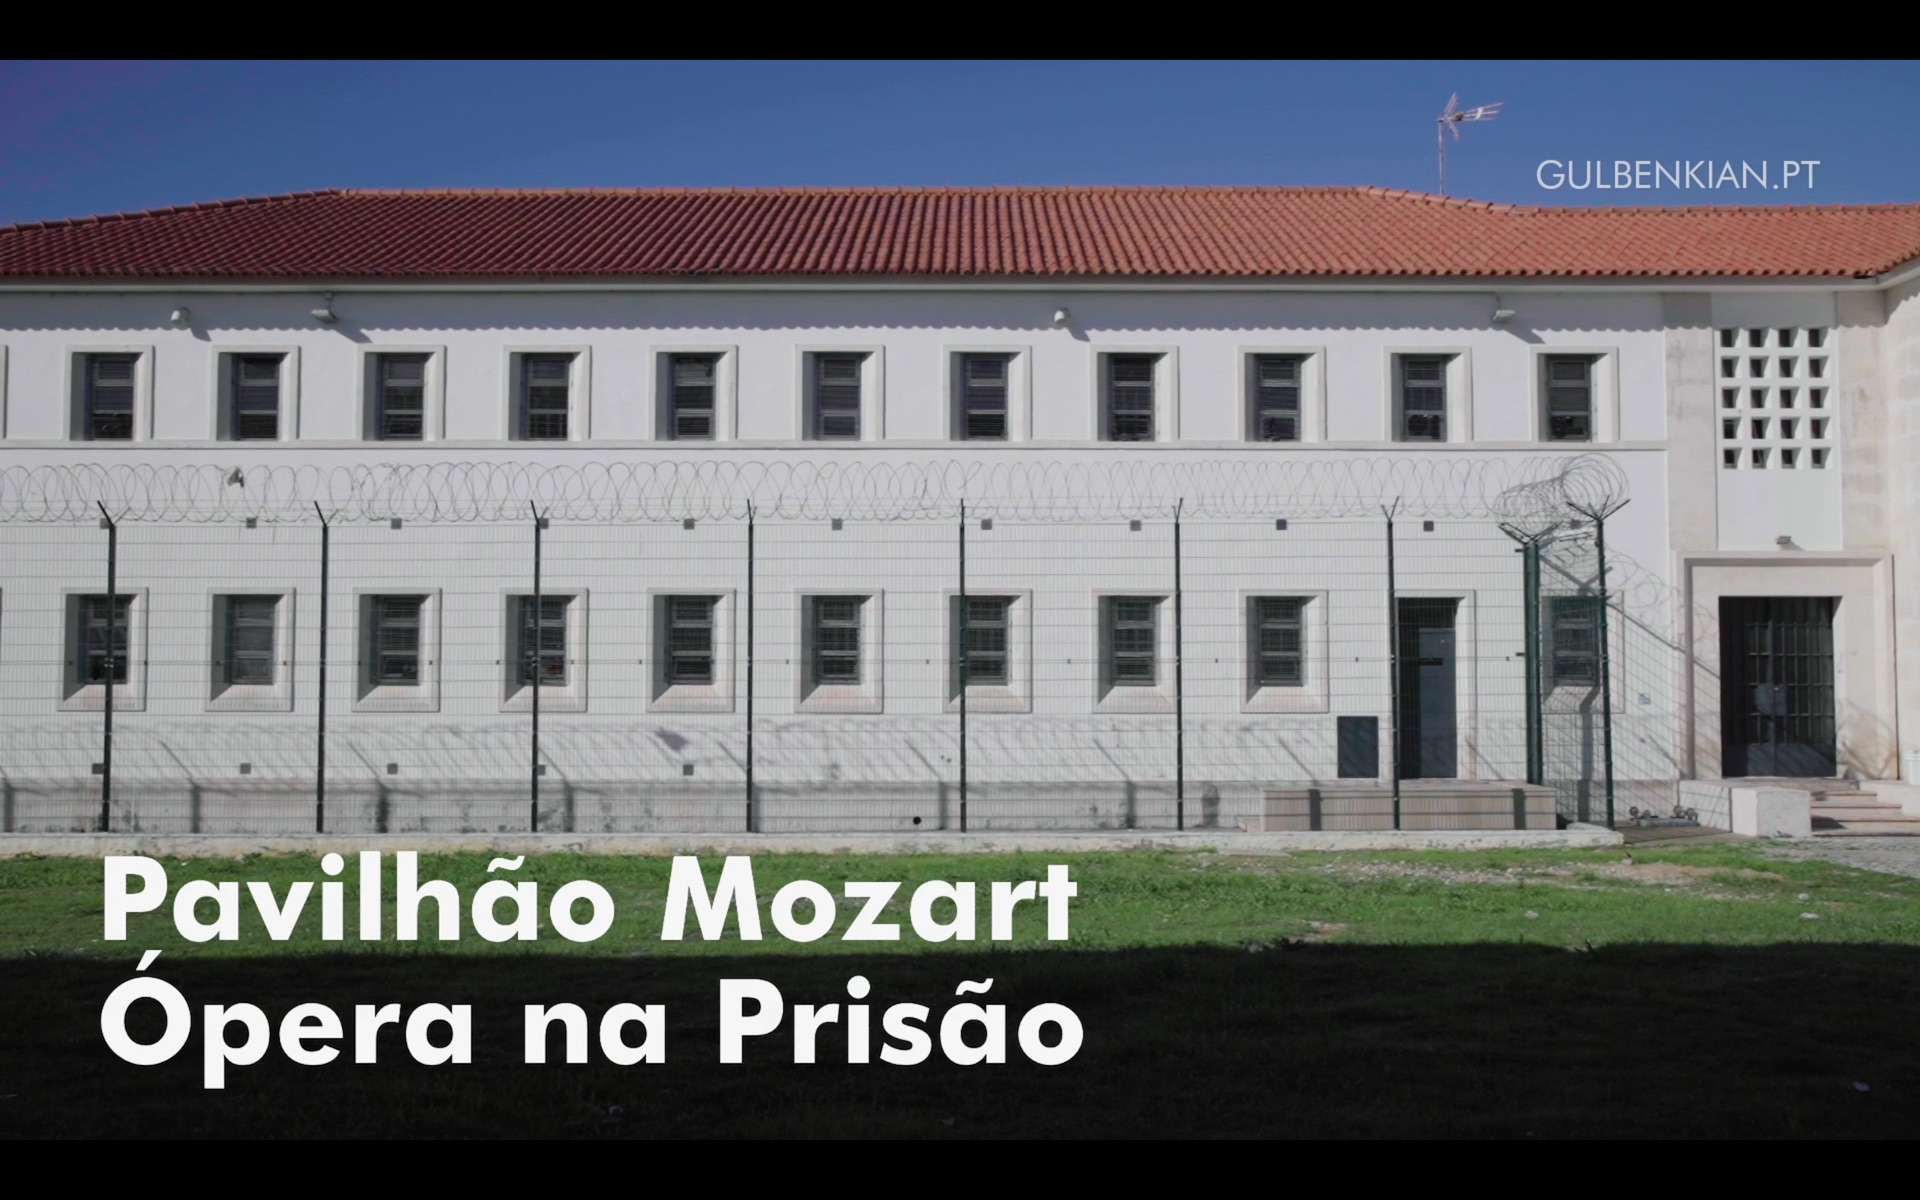 Pavilhão Mozart